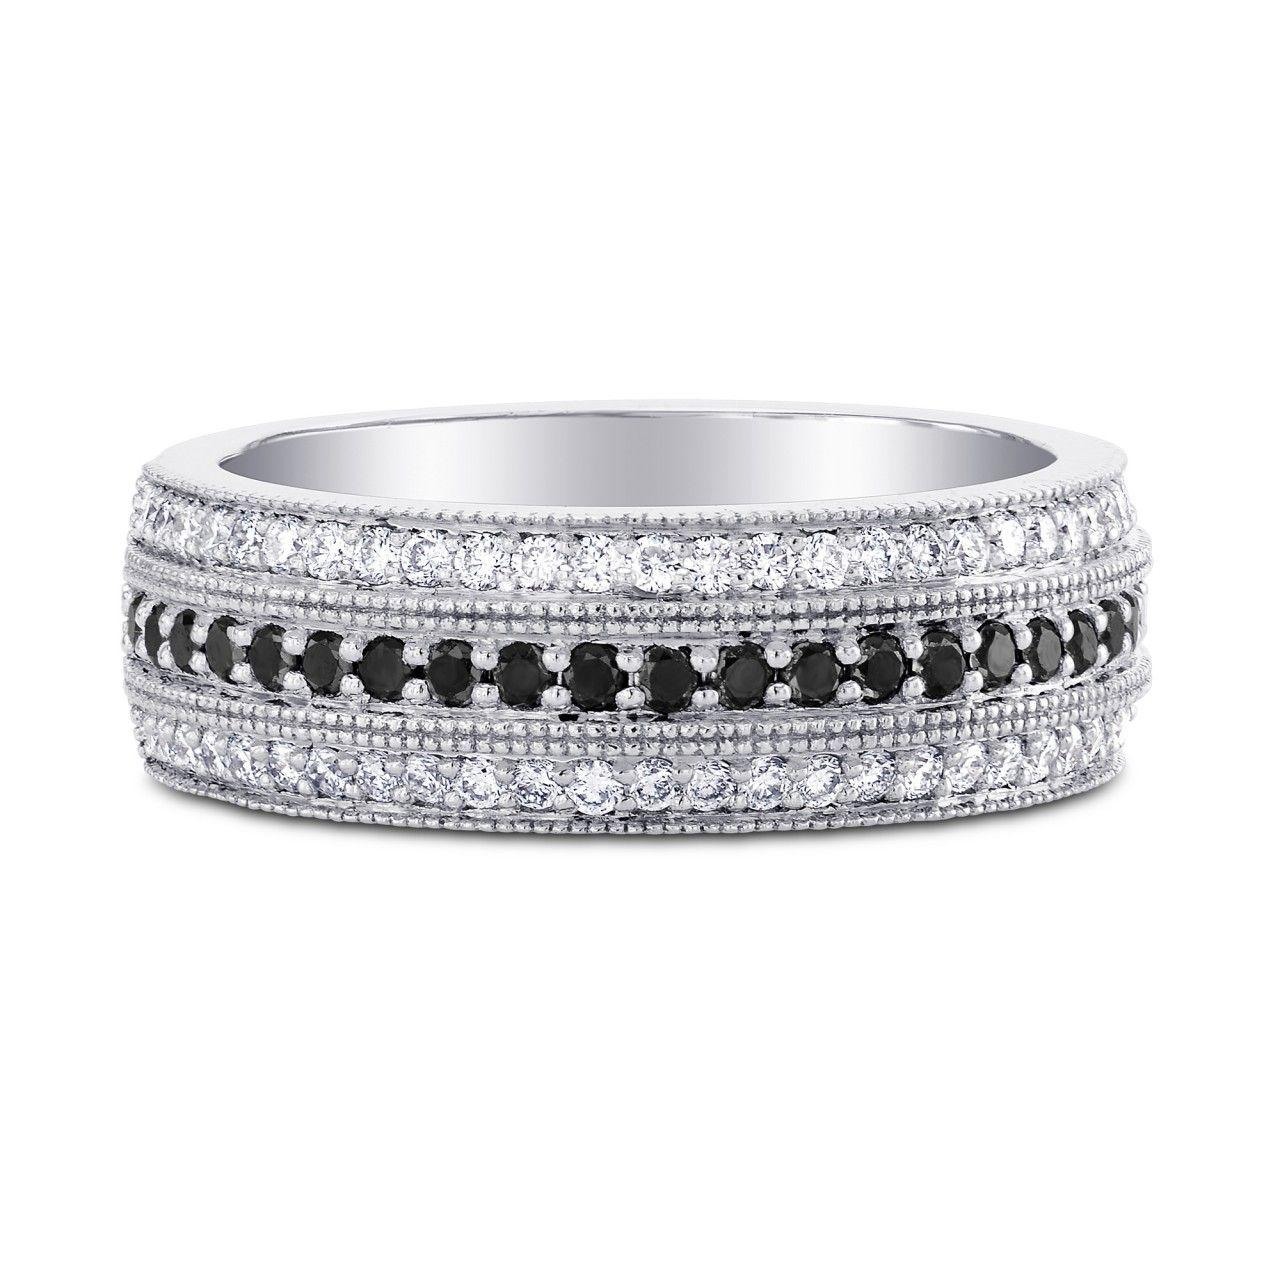 Wide Black Diamond Milgrain Wedding Band Ring, SKU 215469